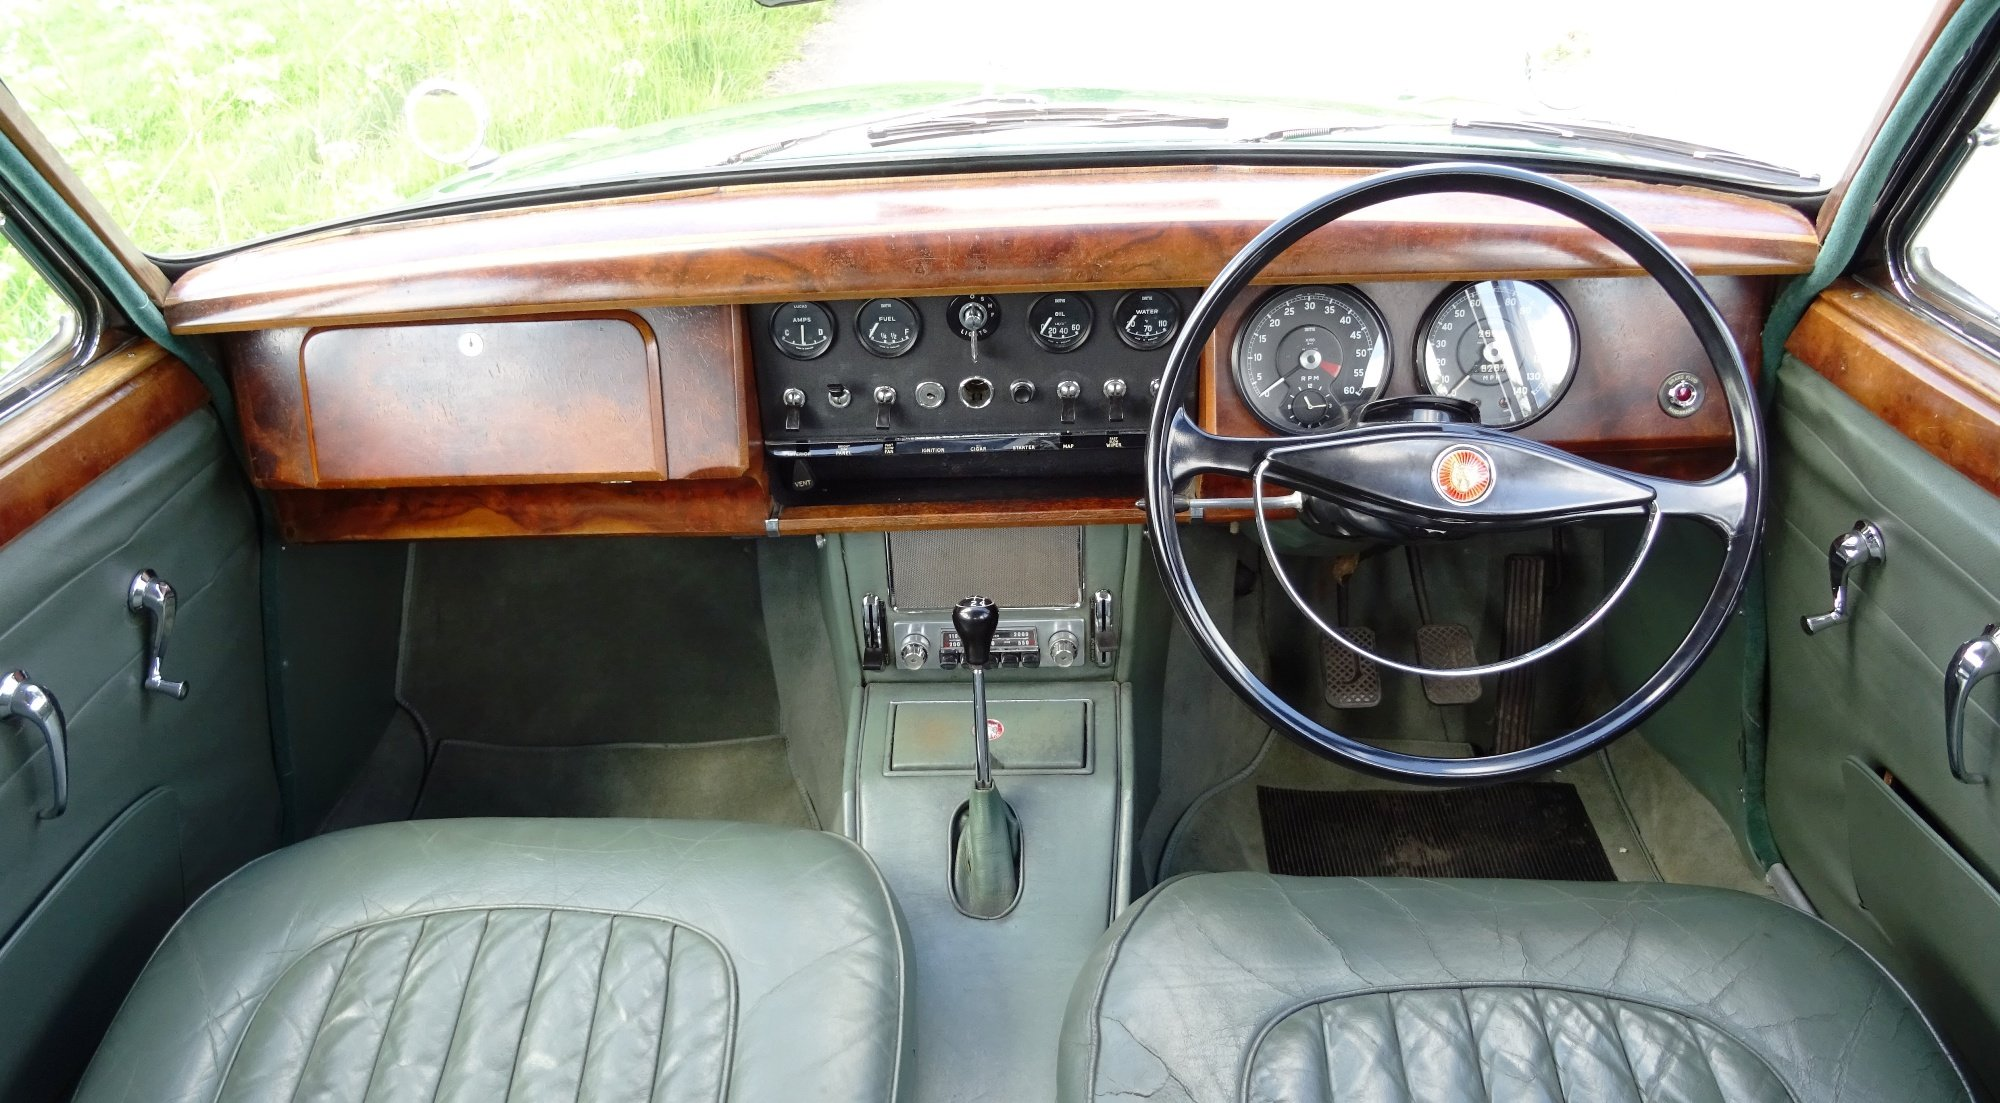 1961 JAGUAR MK2 3.8 LITRE BEAUTIFUL BRITISH CLASSIC CAR For Sale (picture 6 of 6)